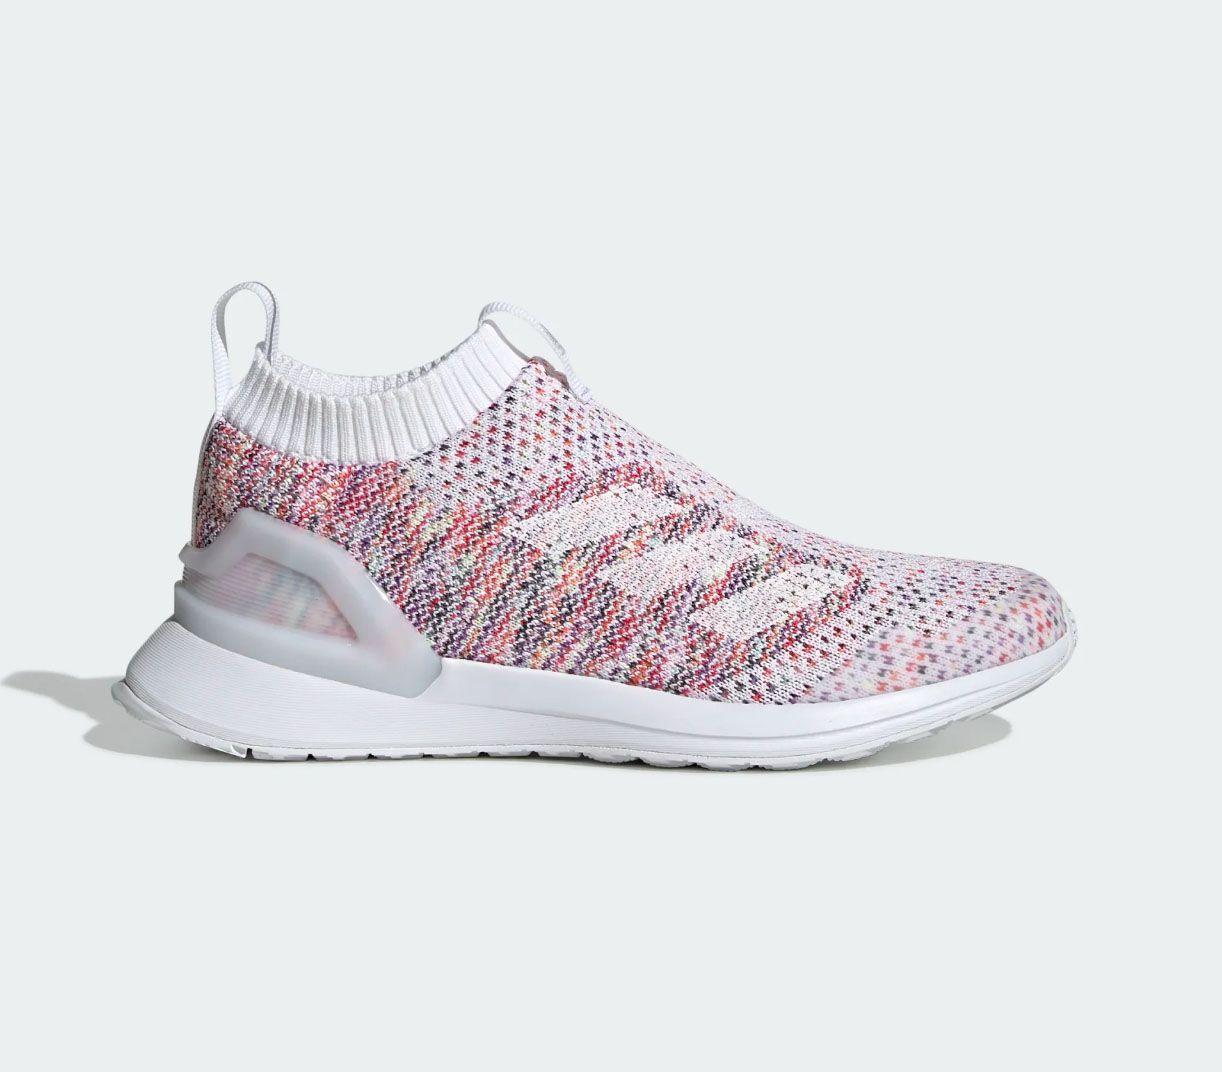 Adidas Shoes for Girls – Girls Running